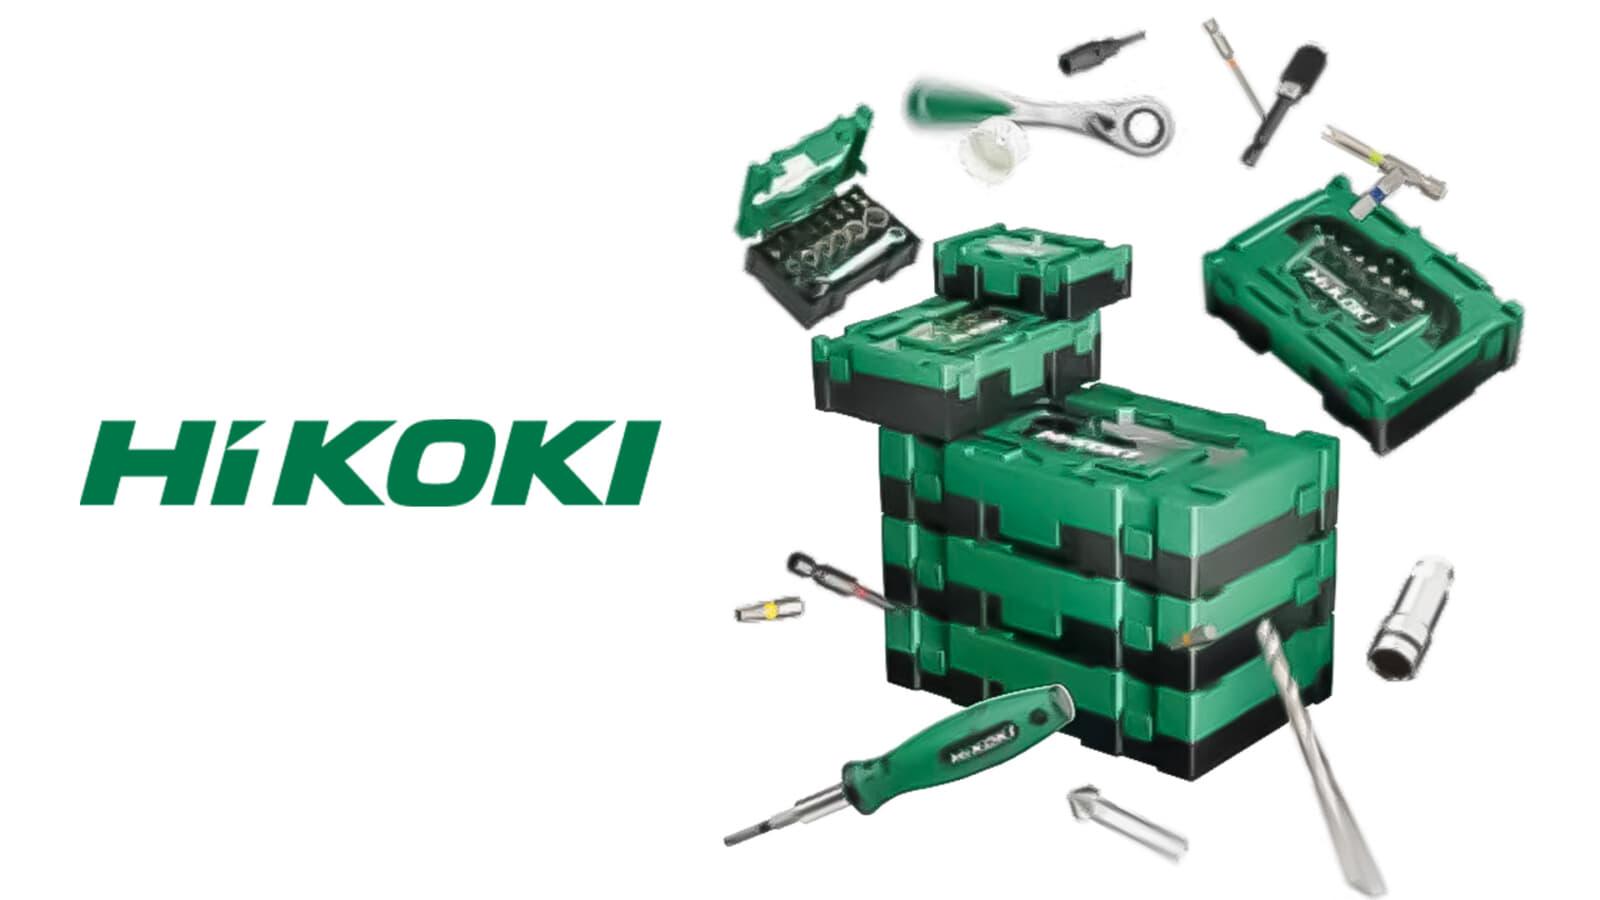 HiKOKI スタッカブルシリーズ、手のひらサイズのアクセサリセット